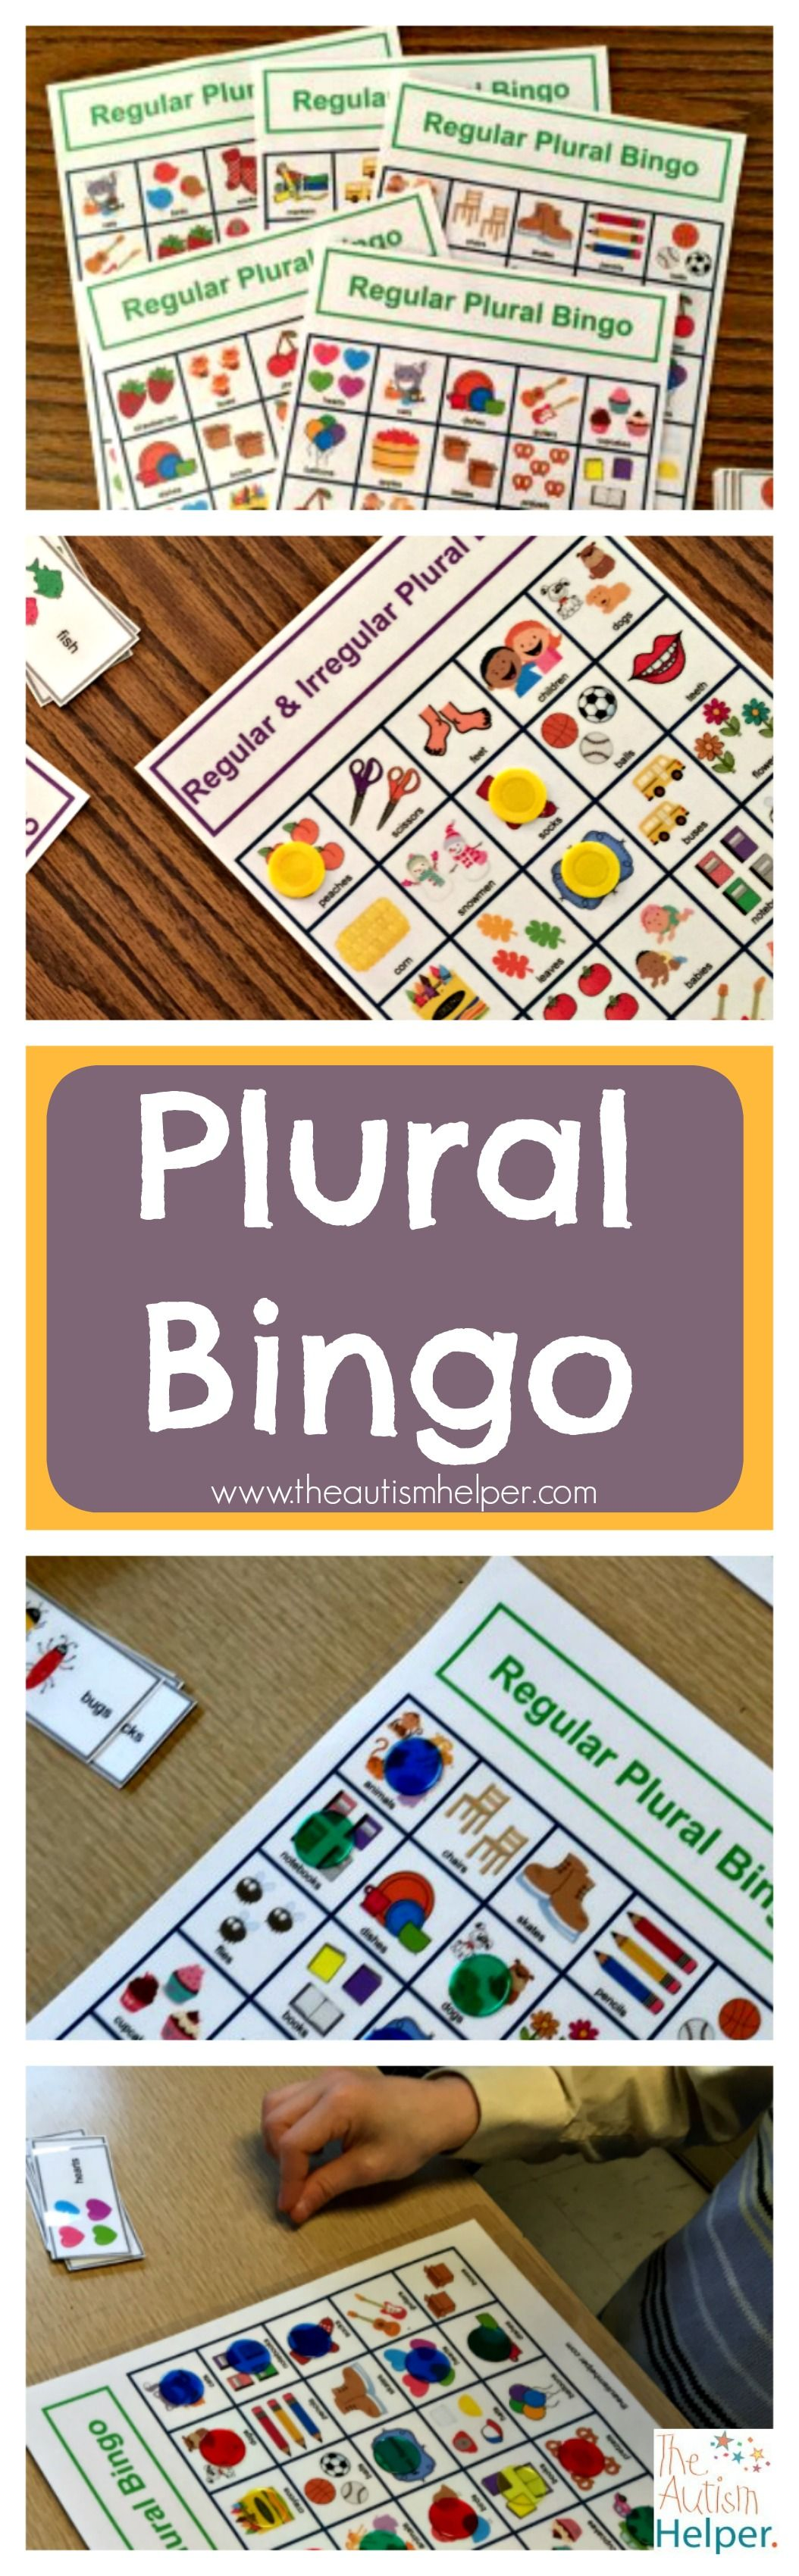 Plural Bingo